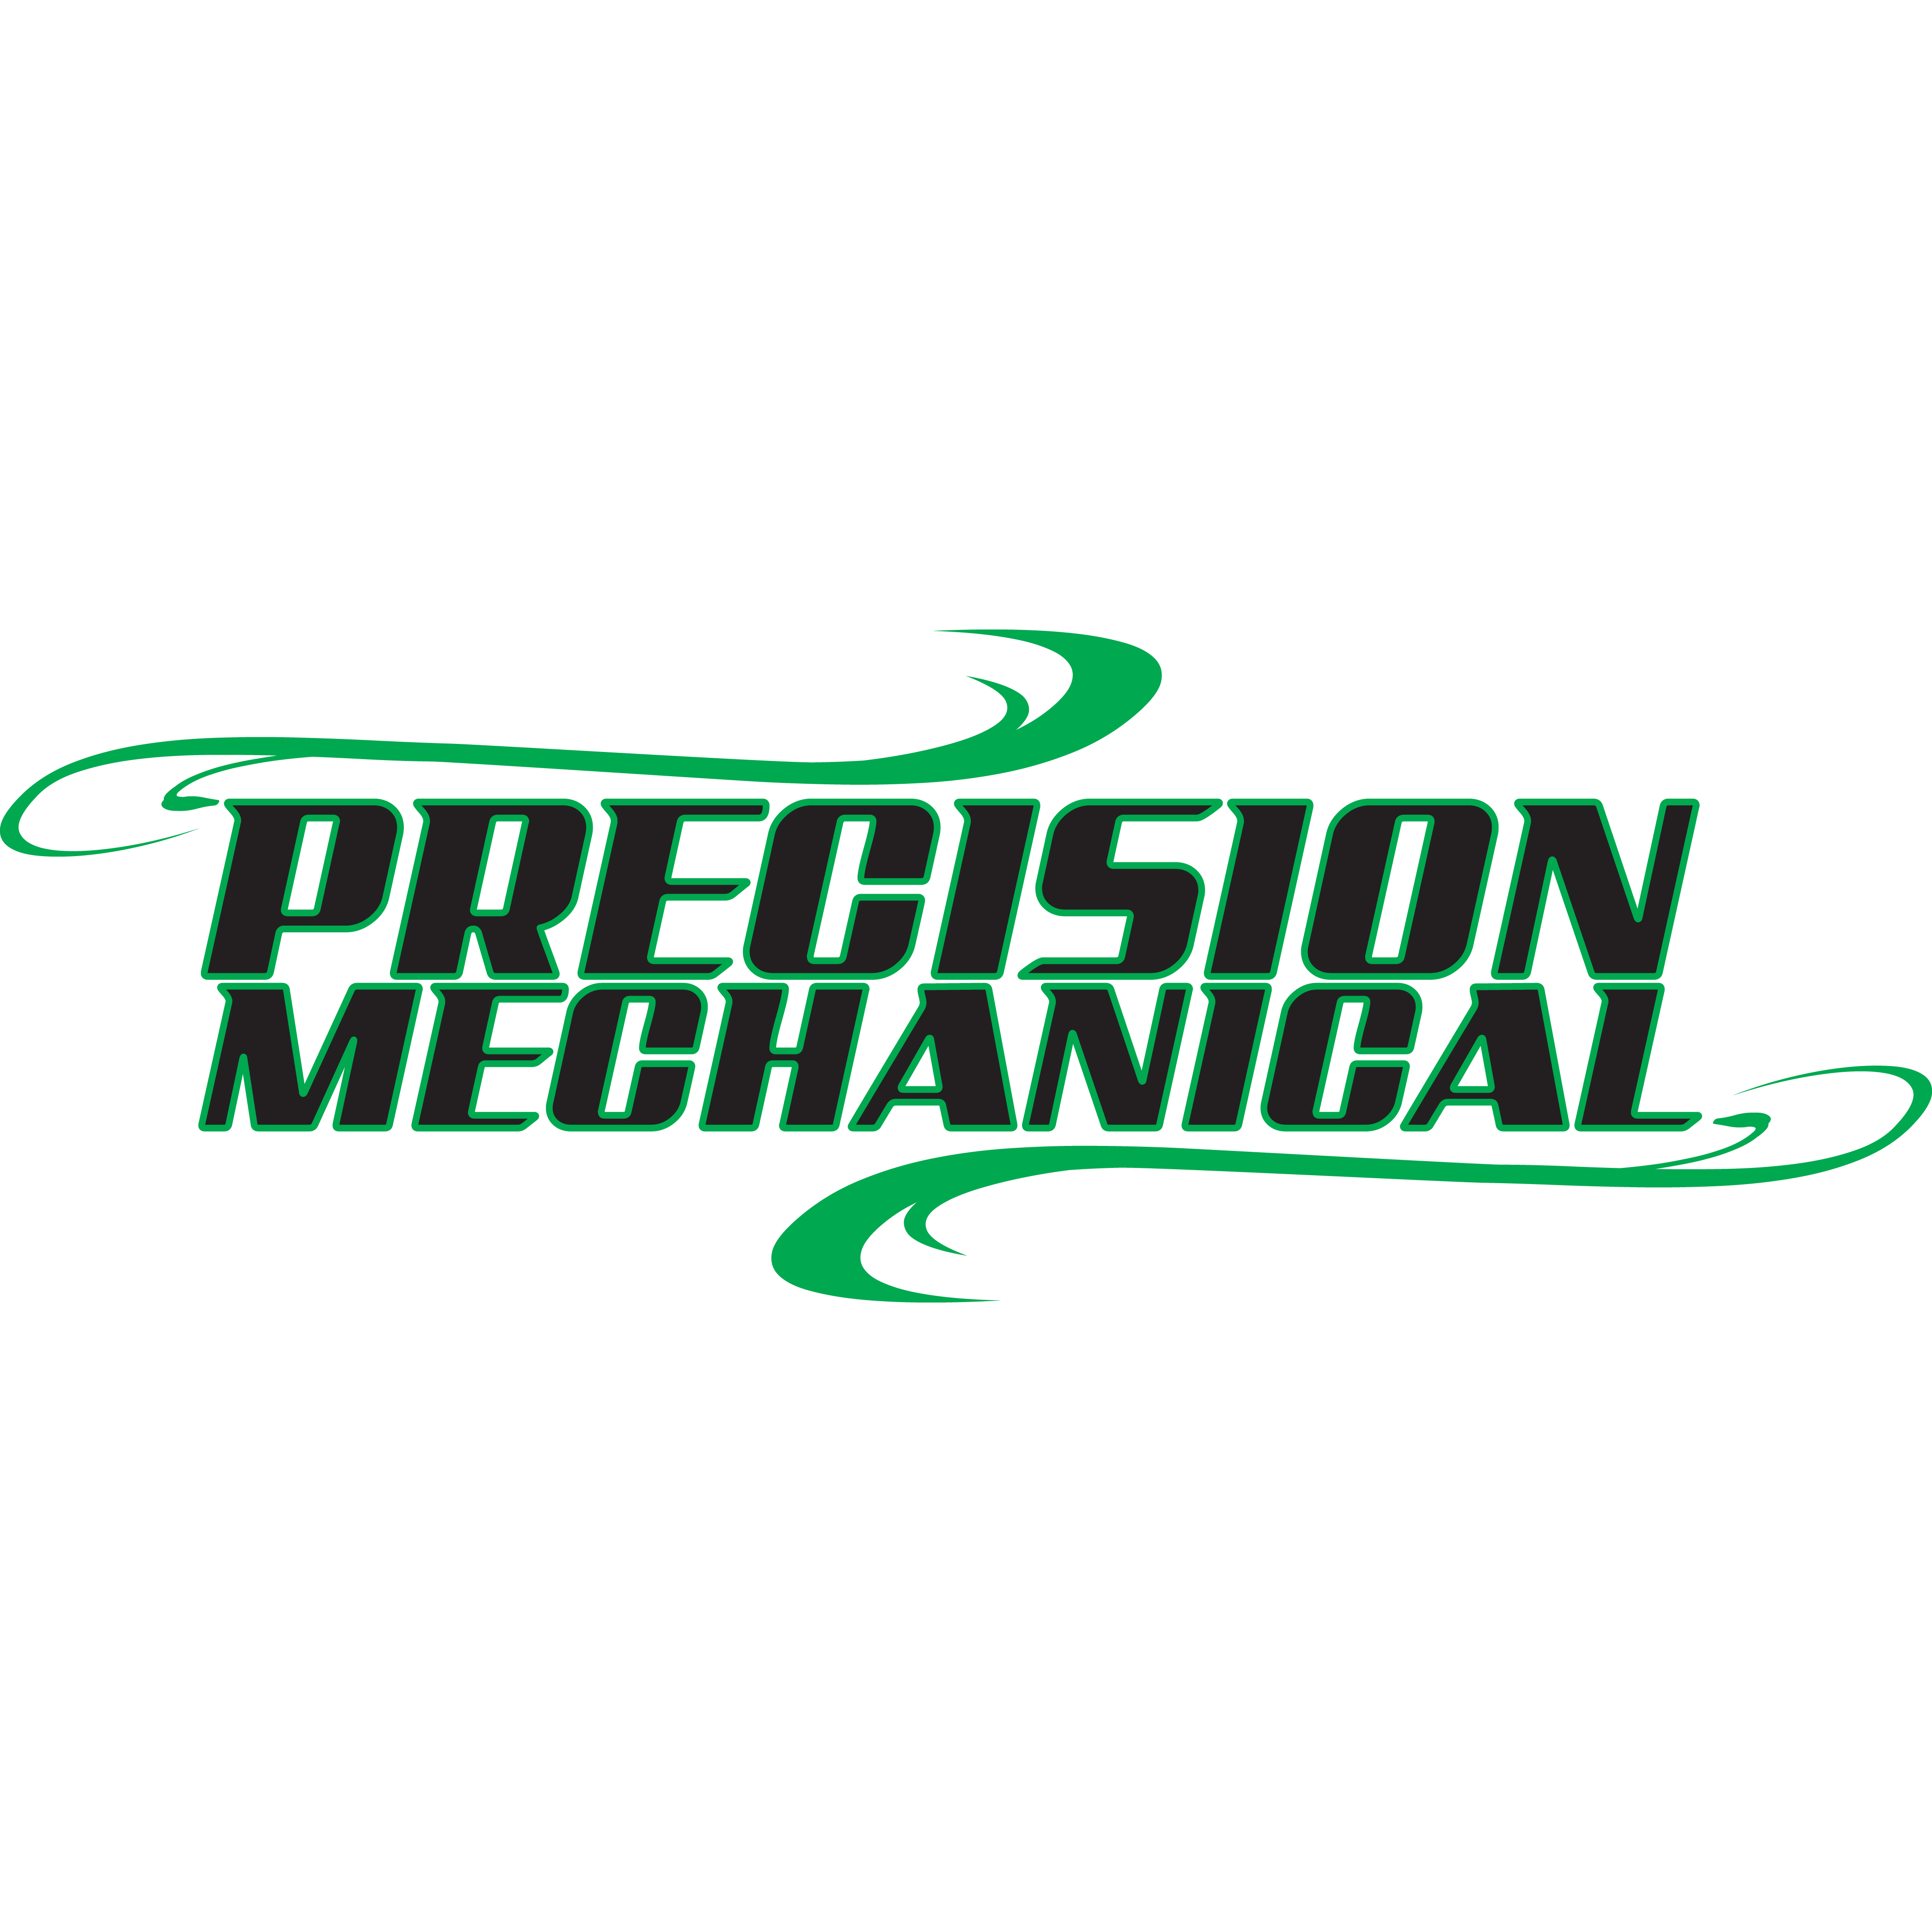 Precision Mechanical, LLC